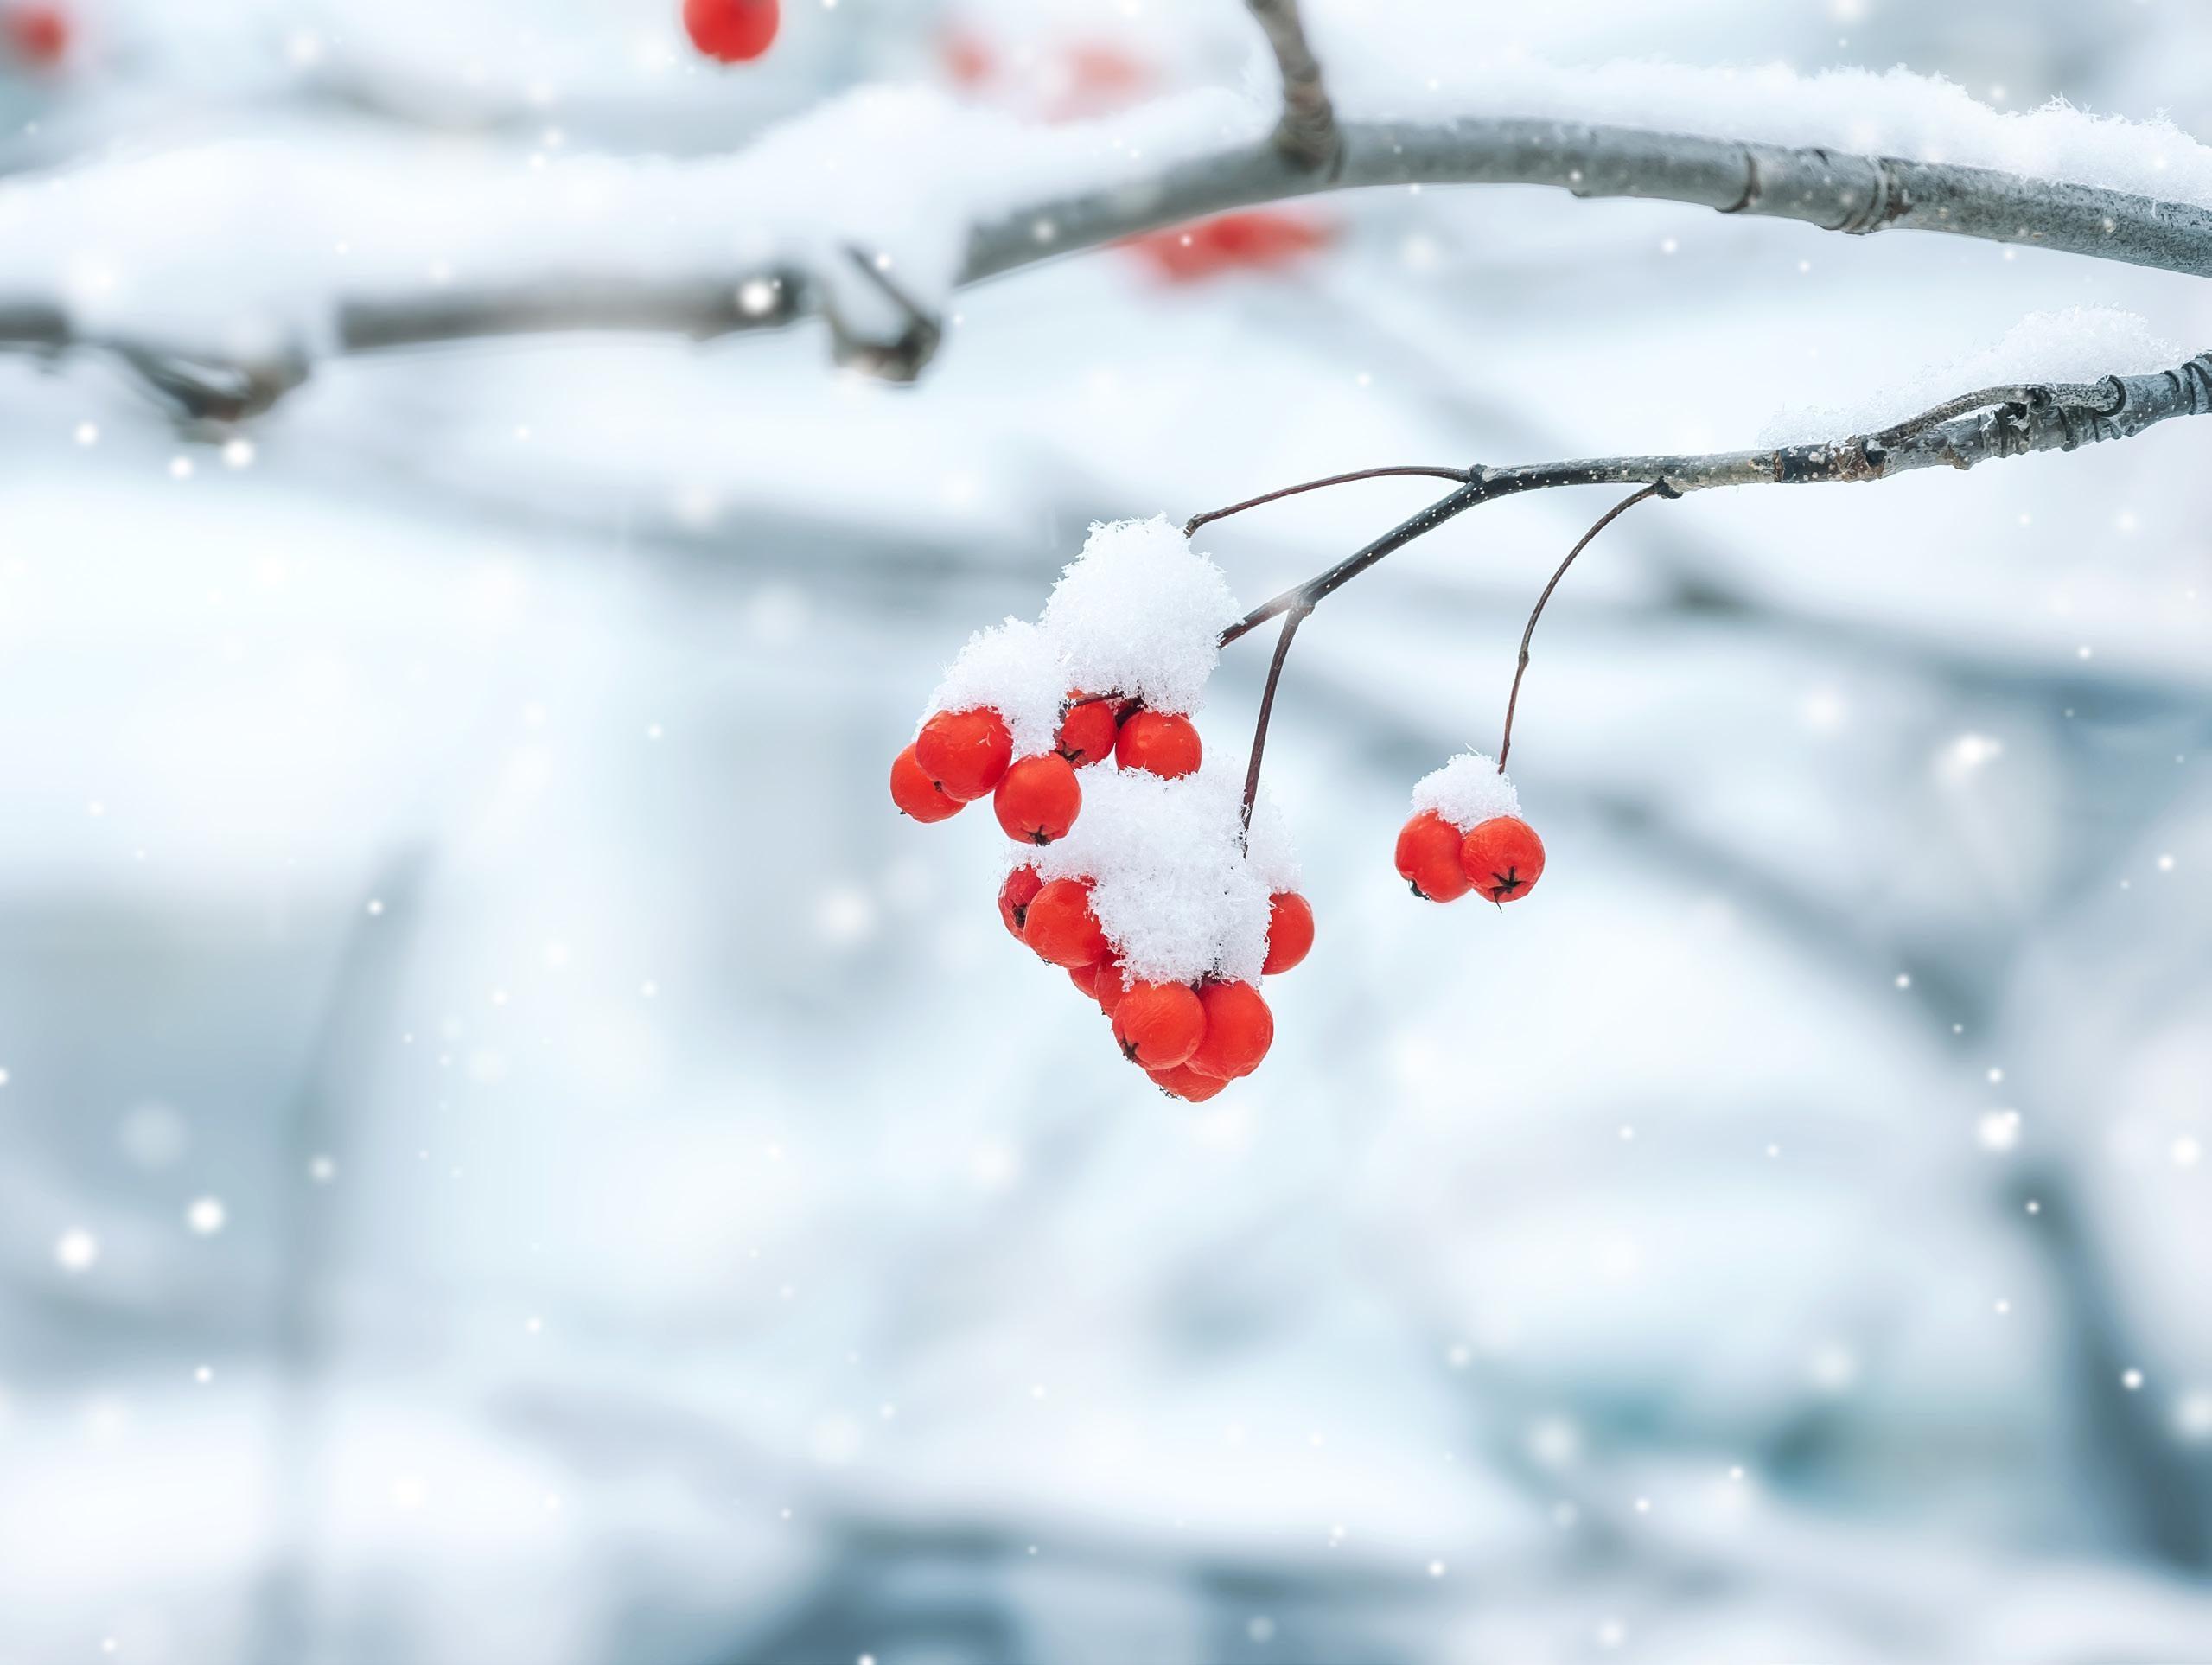 Read story: Thoreau in Winter